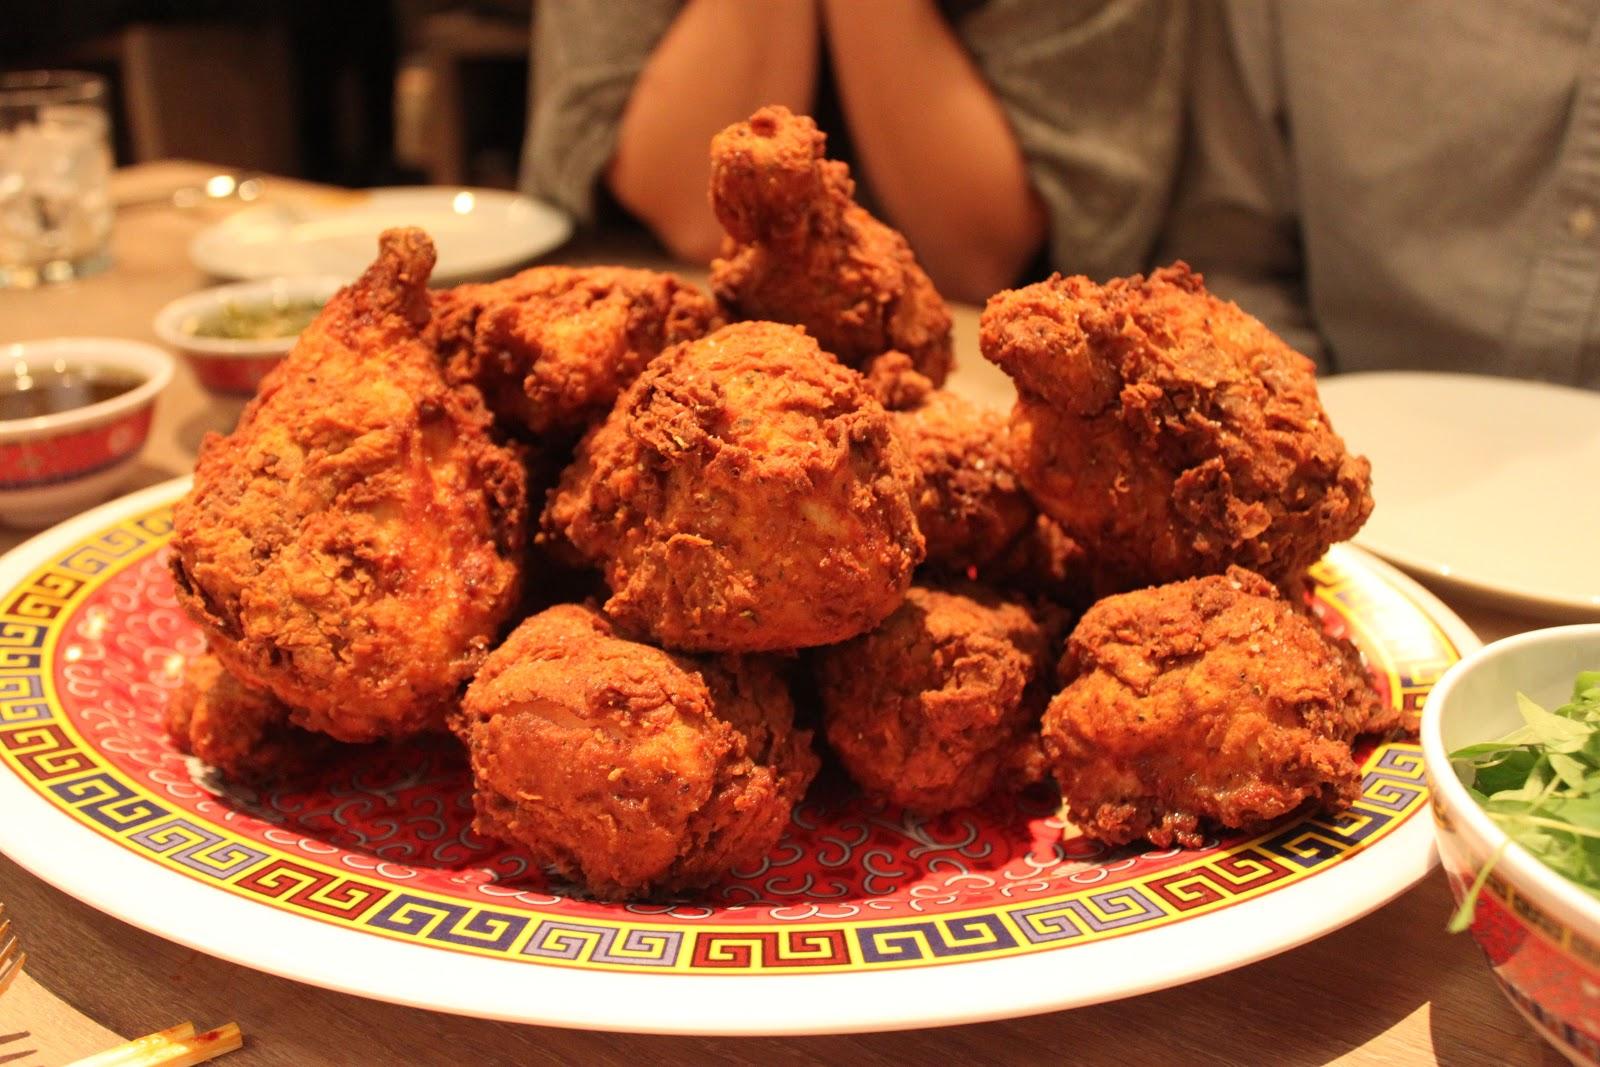 ... & Urban Girl's Guide: Urban Eats @ The Momofuku Fried Chicken Dinner